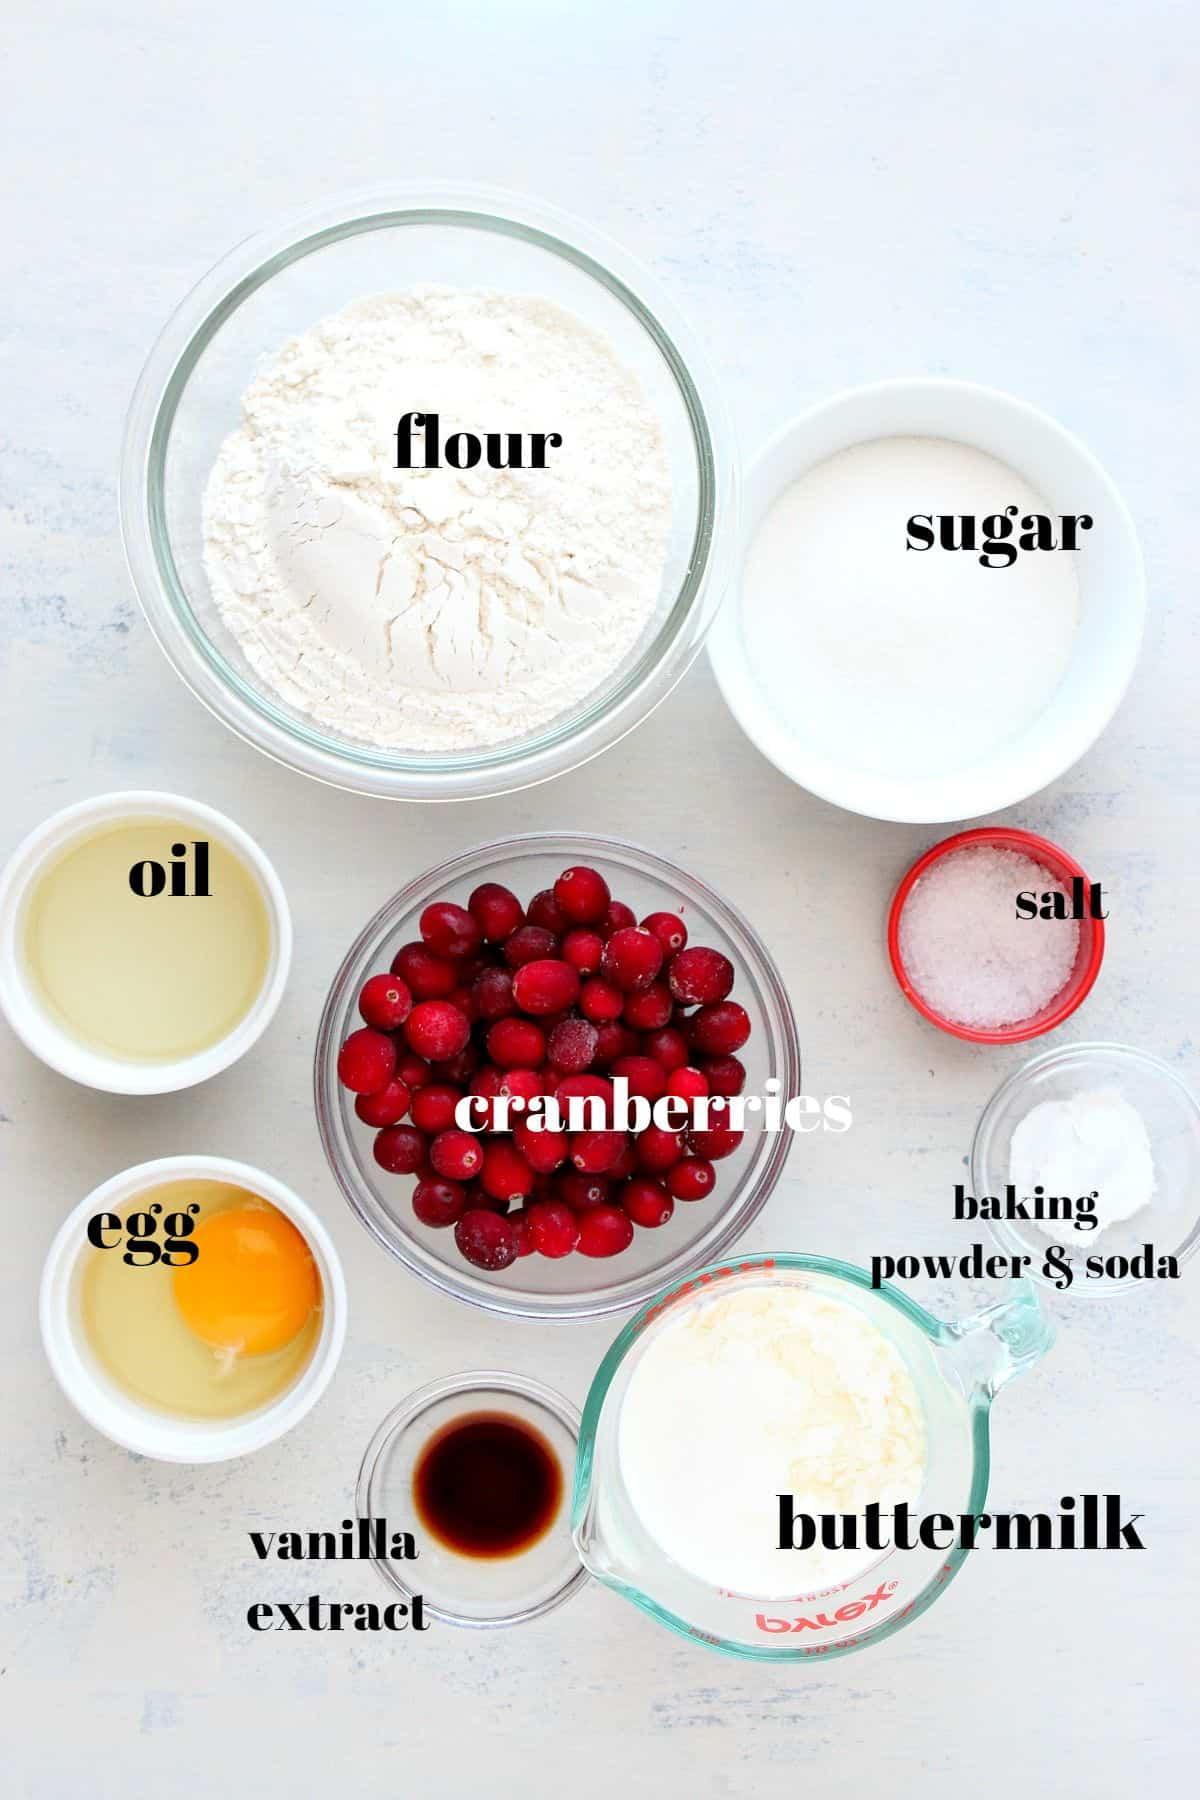 cranberry muffins ingredients 1 Glazed Cranberry Muffins